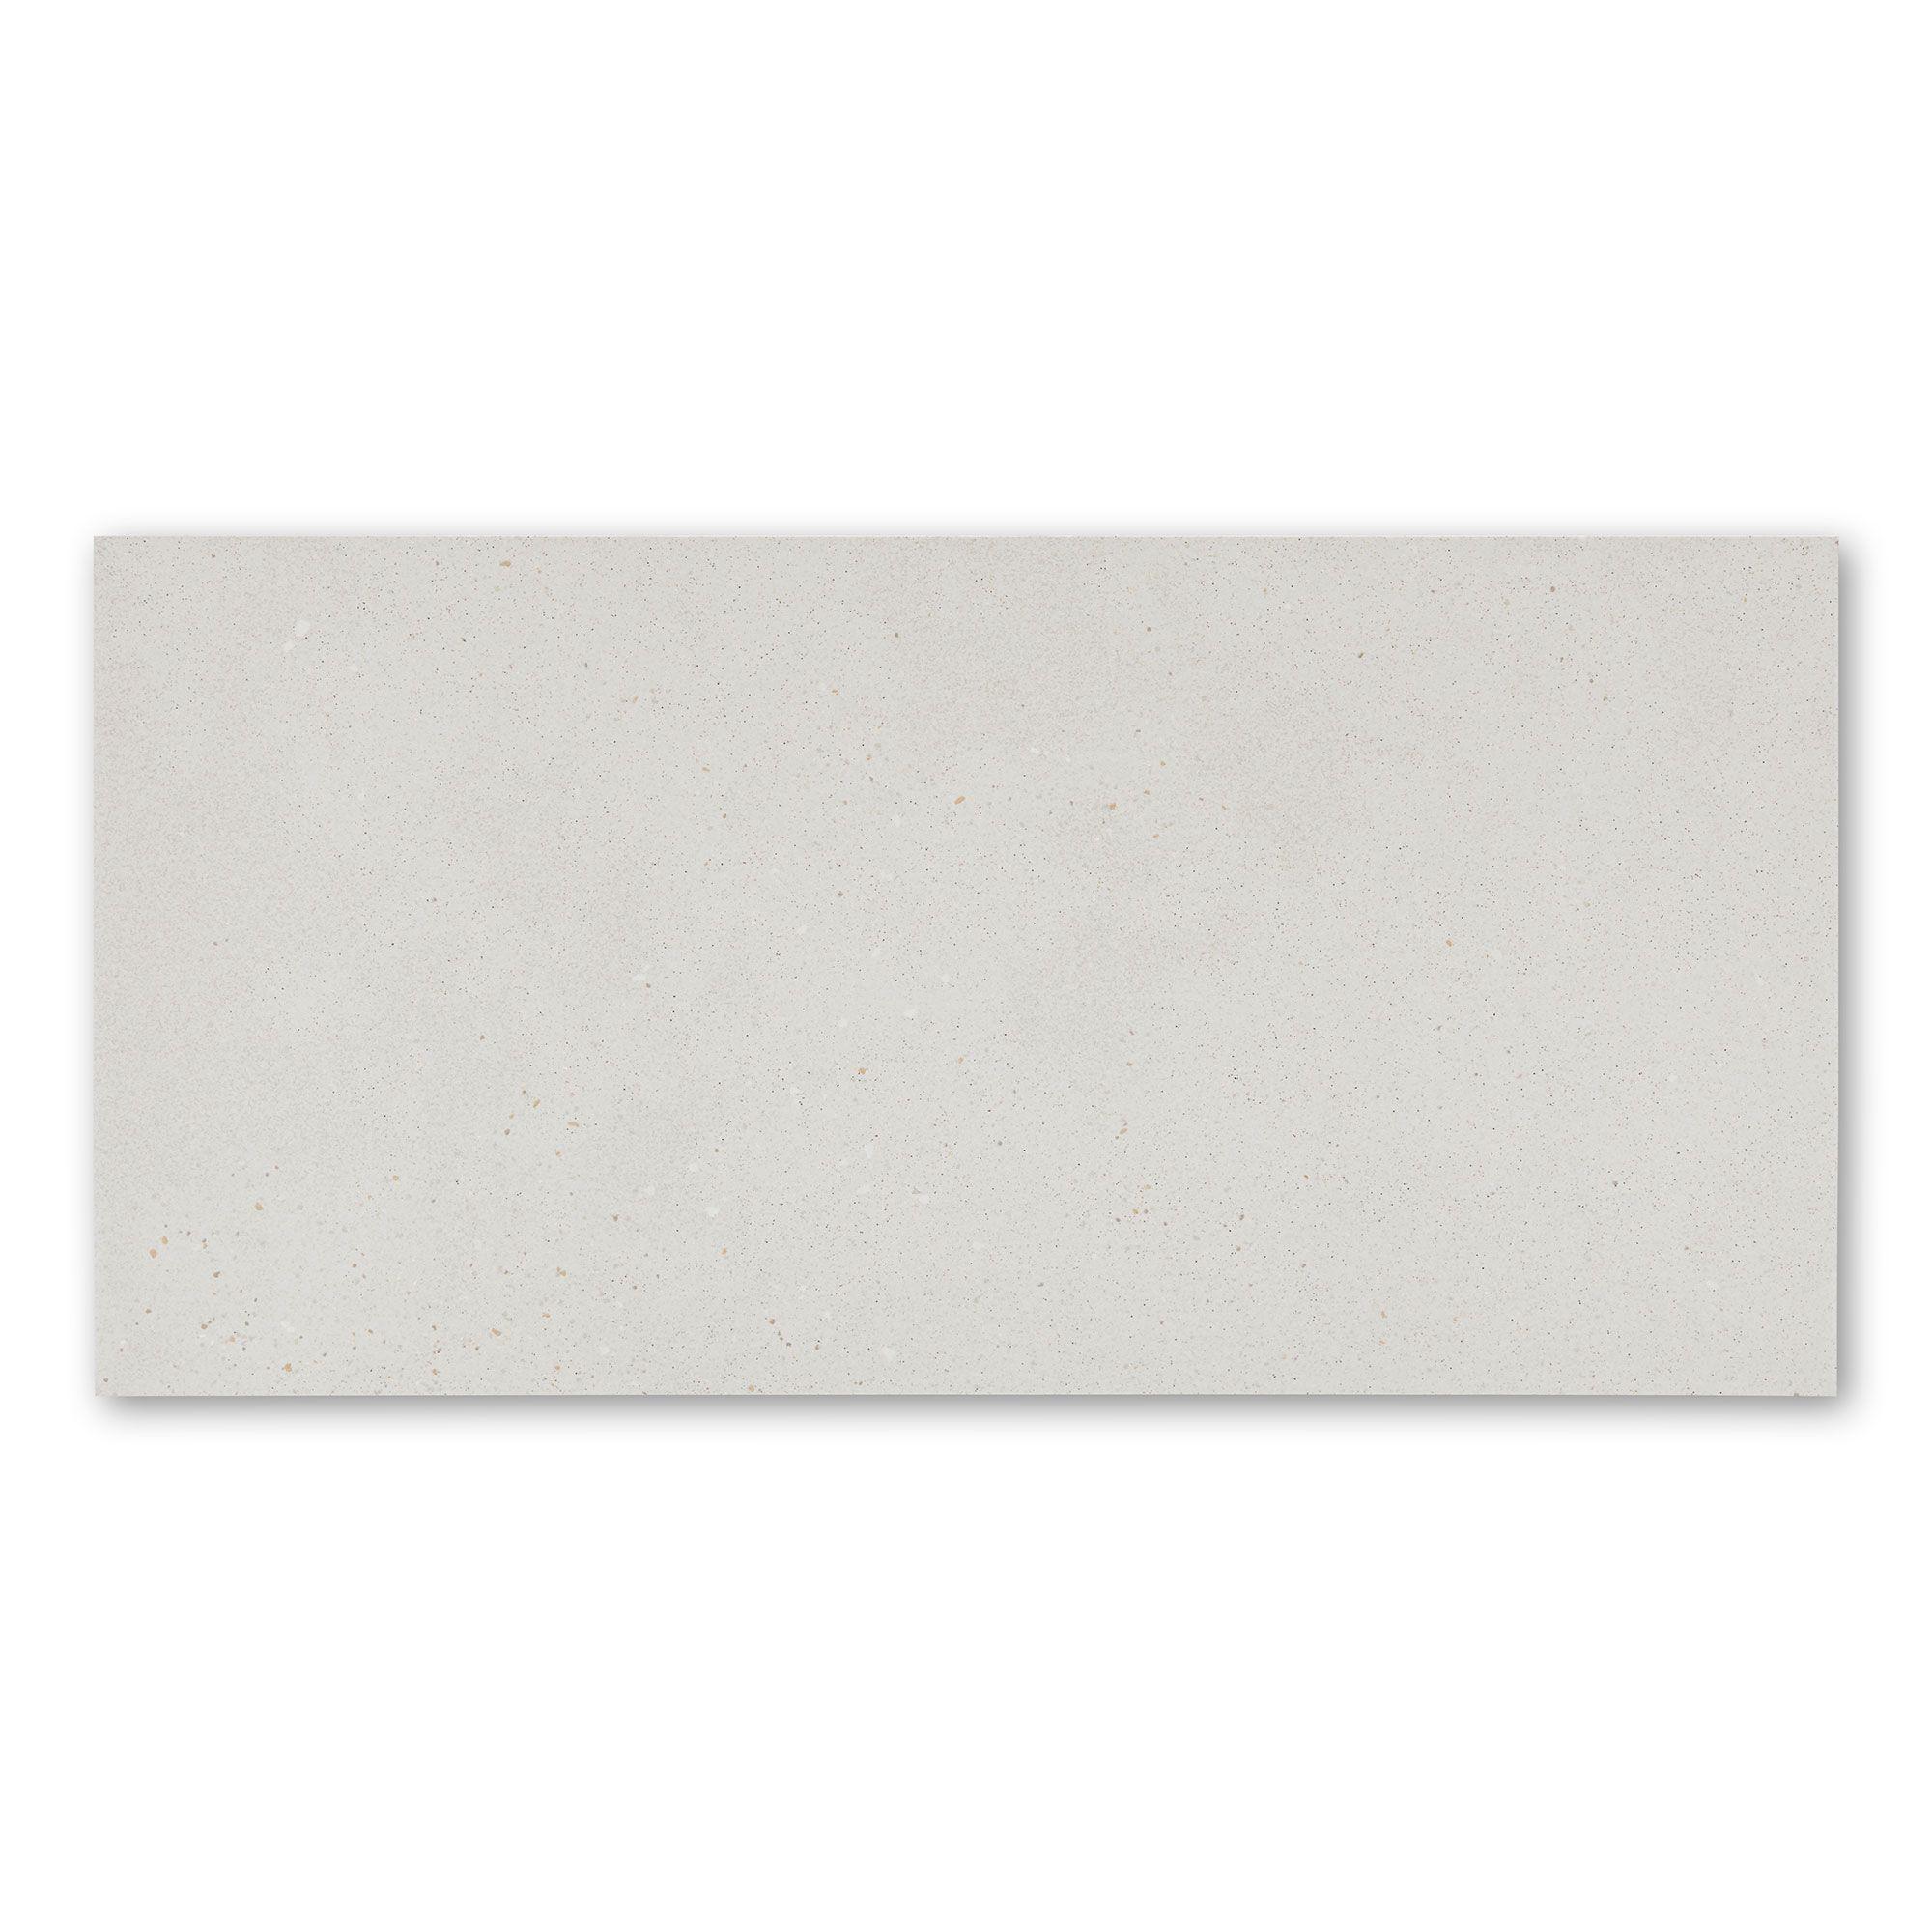 Umbrian White 60x30